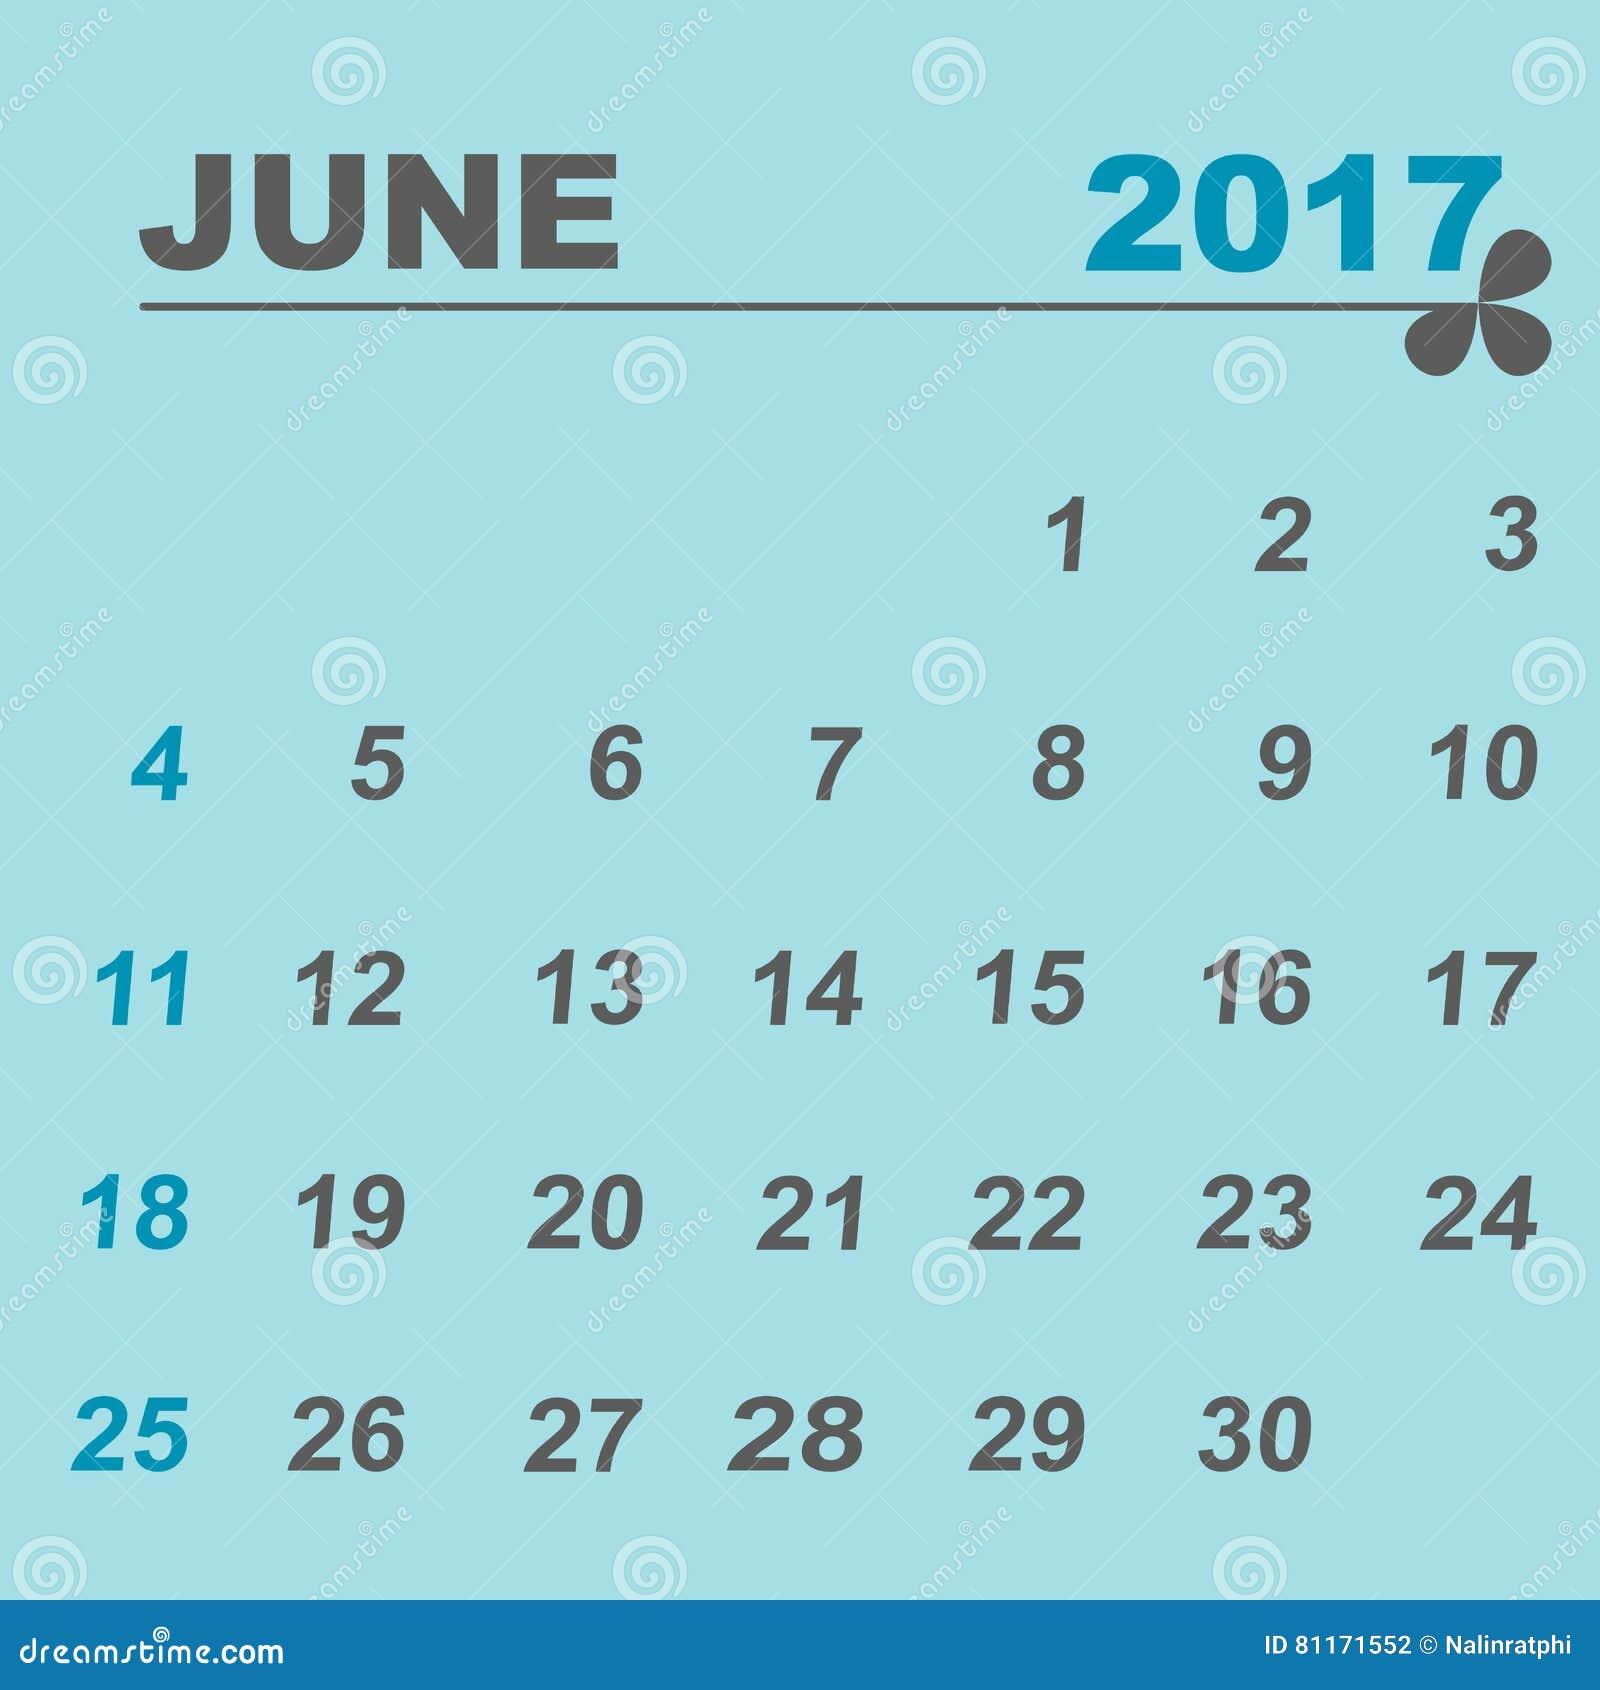 june calendar 2017 holidays images cartoons